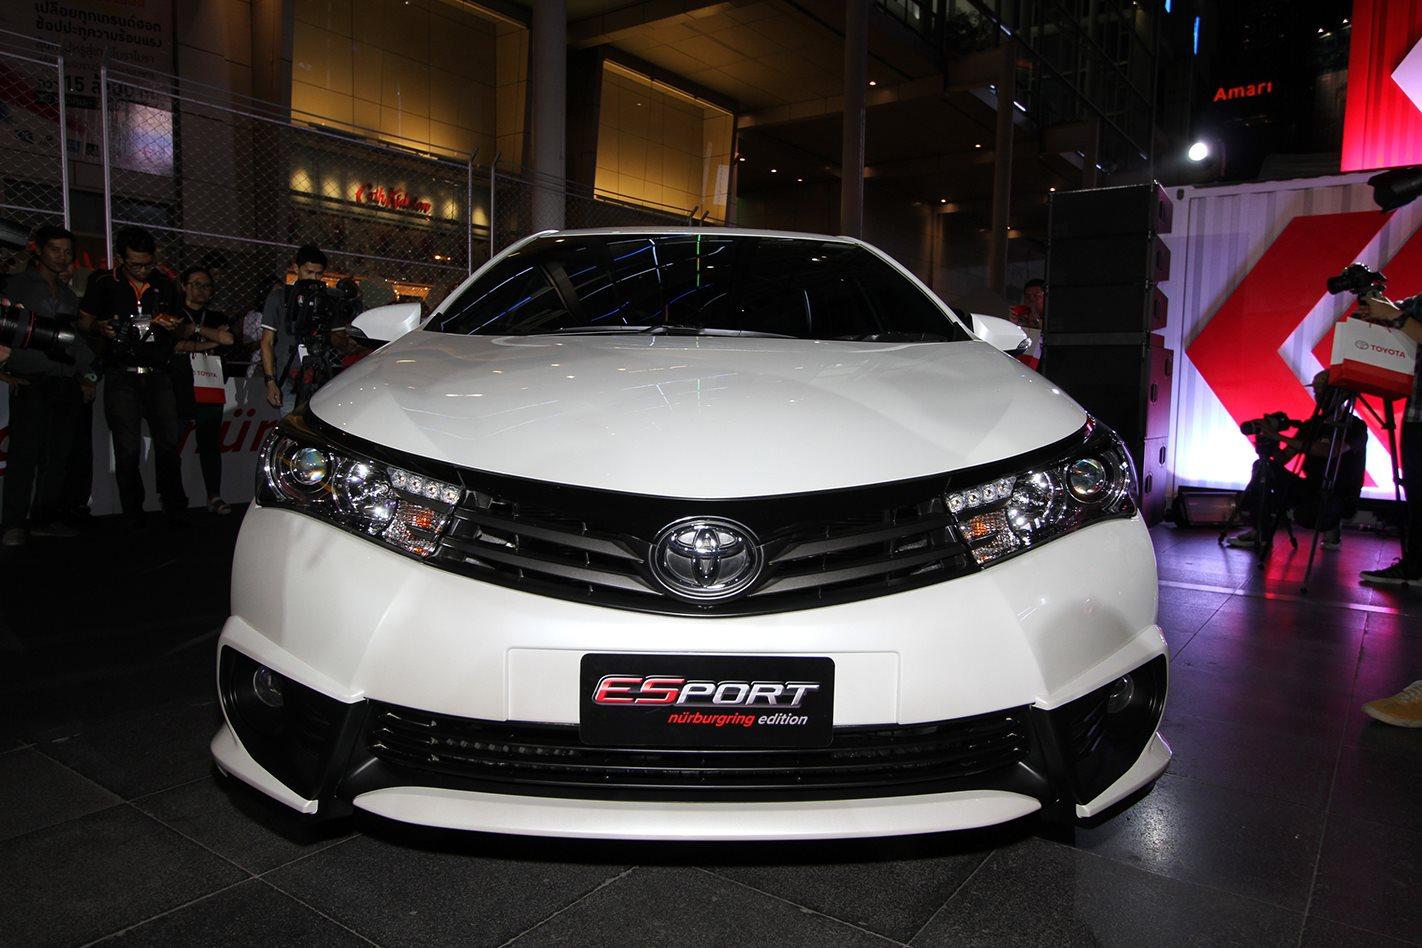 Toyota corolla altis esport nurburgring edition